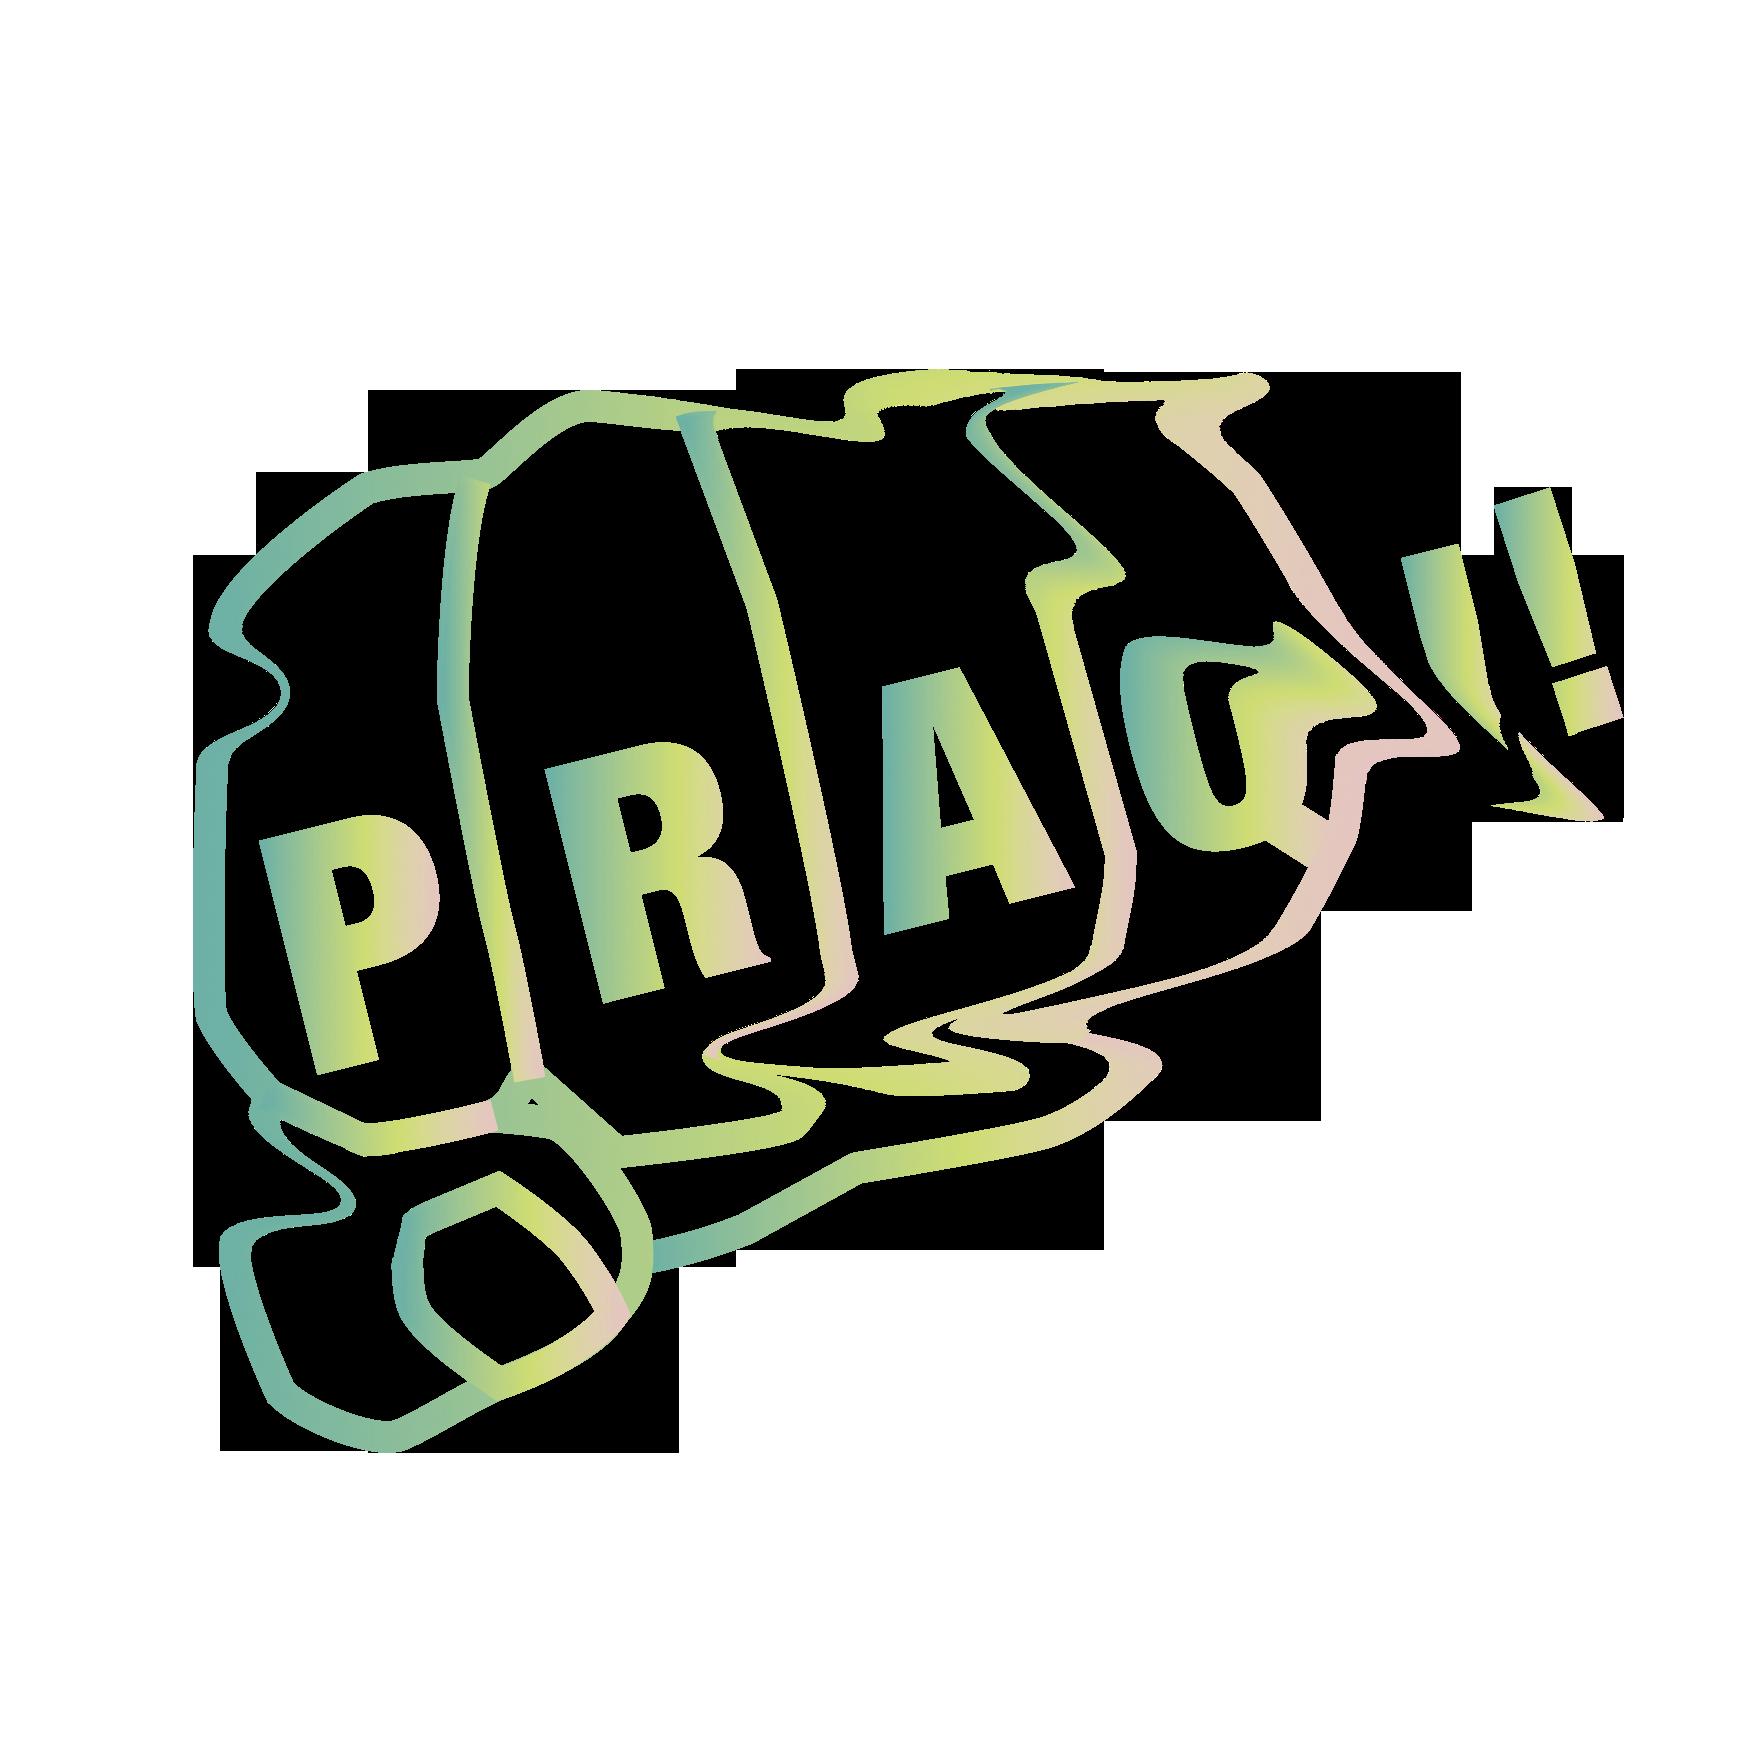 PRAQ – CHECK